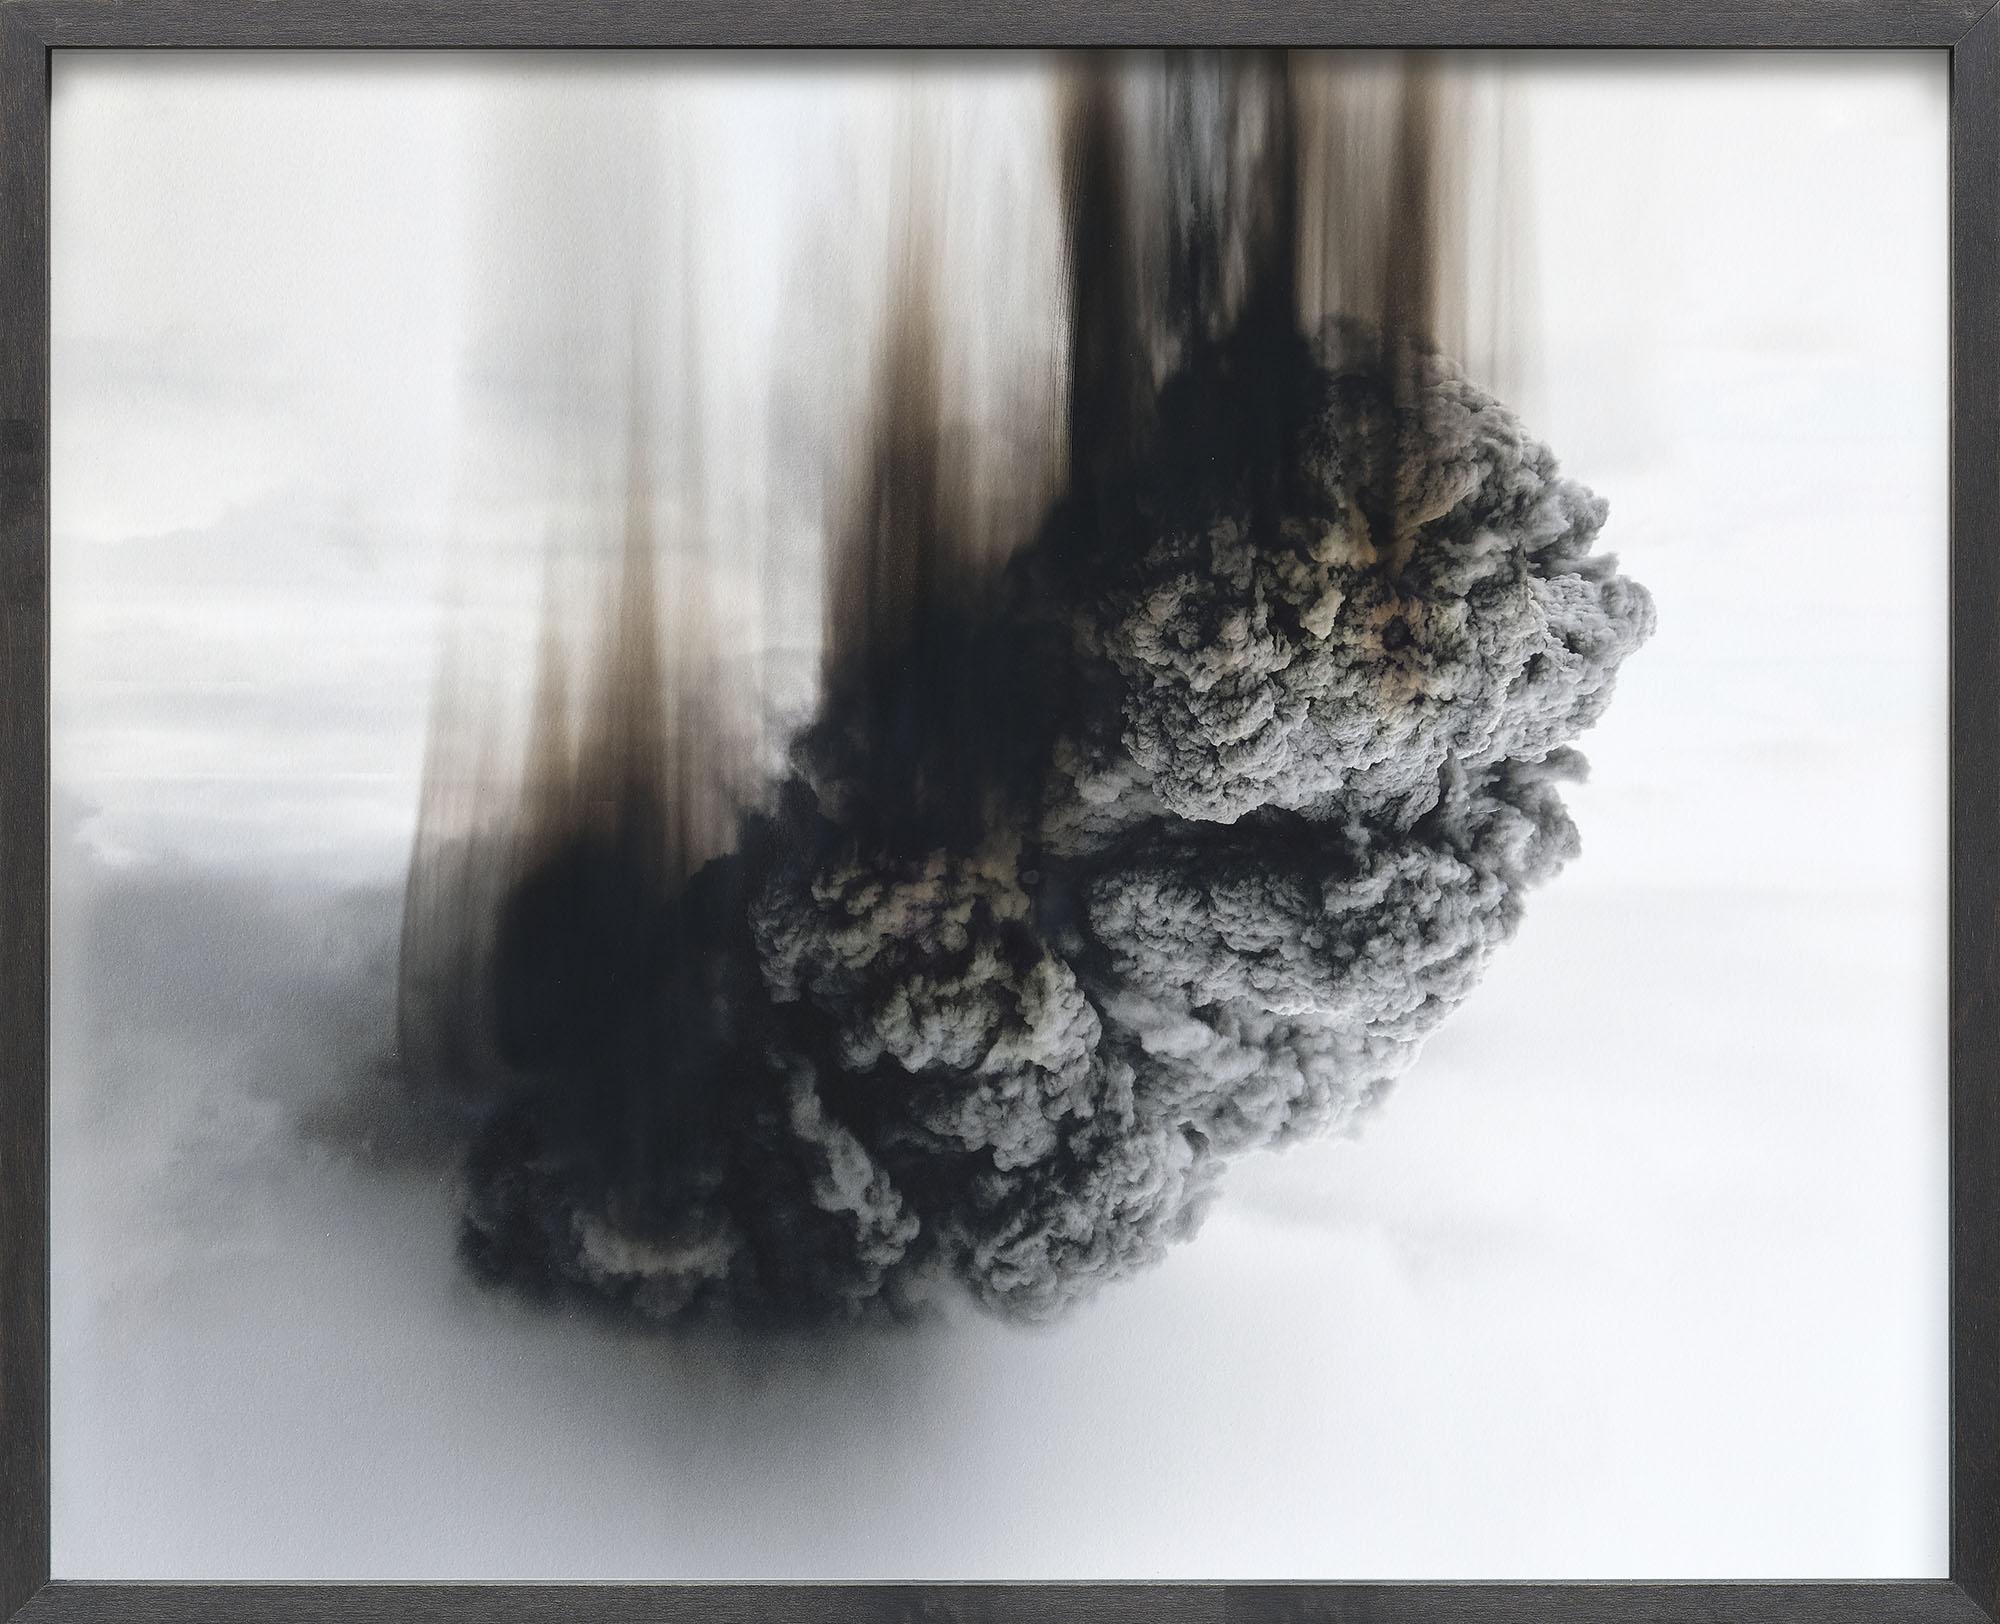 Cloud under Stress 1-Angelika-J-Trojnarski